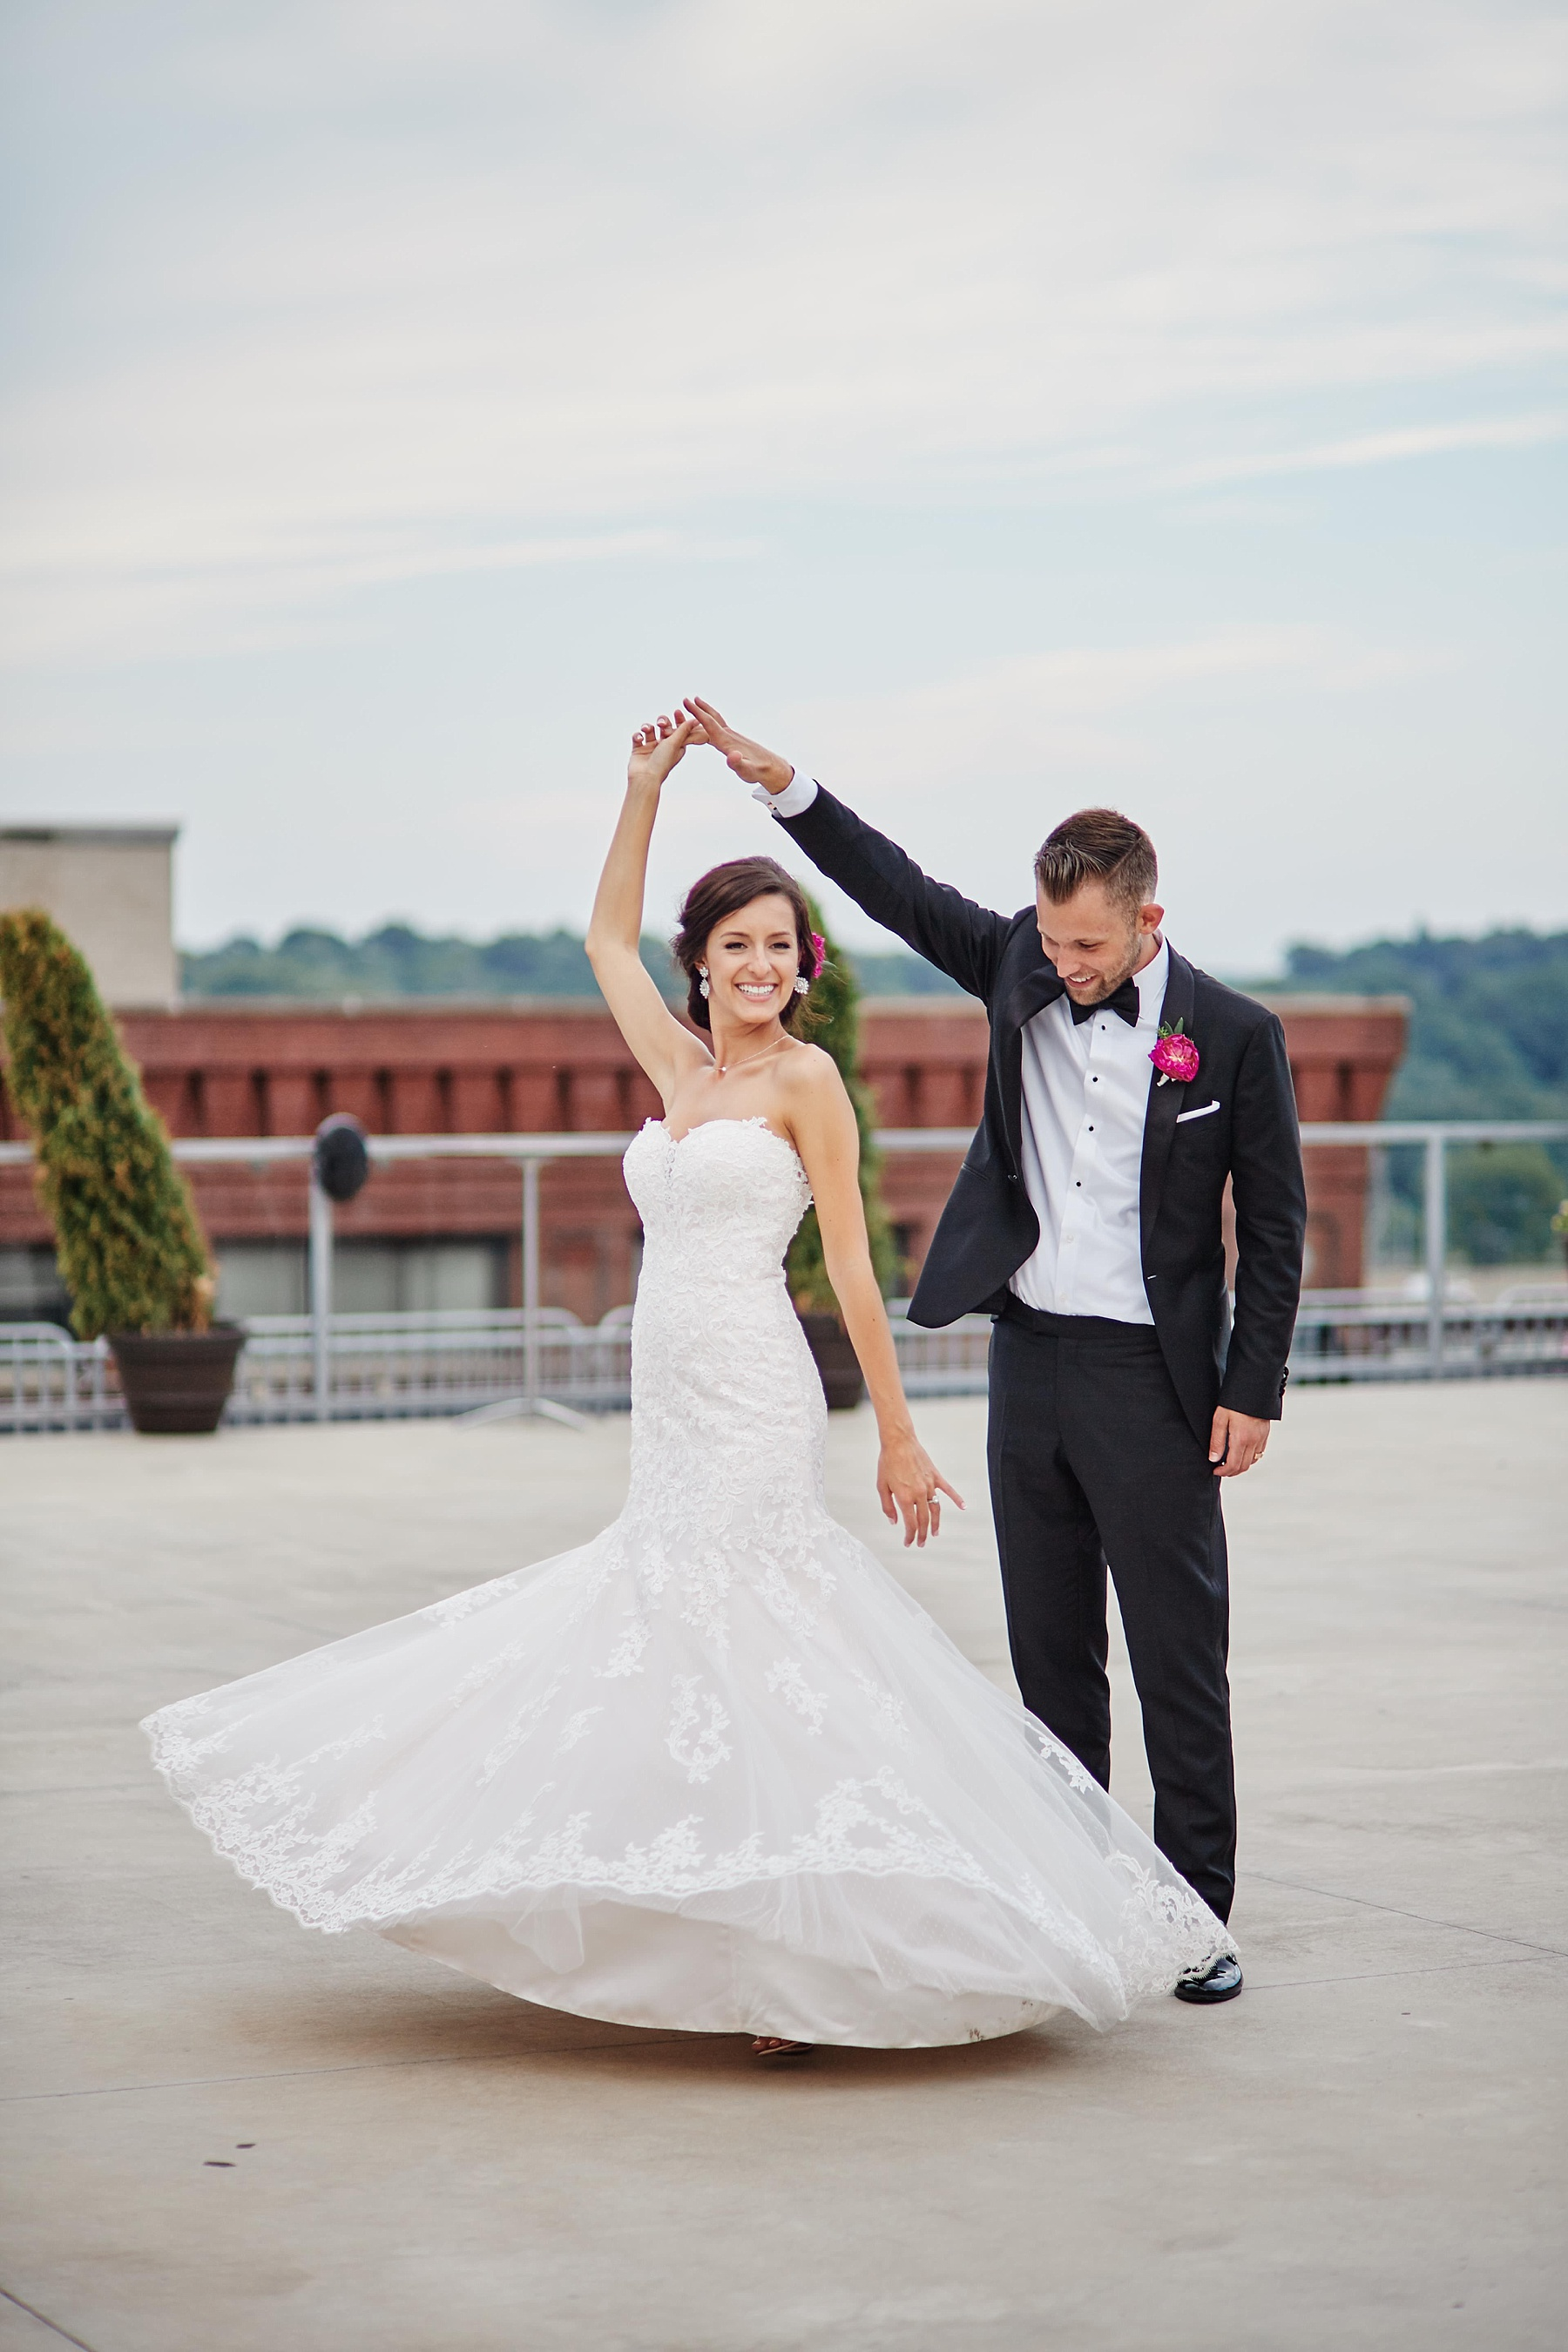 ABULAE-Wedding-Saint-paul-MN-Josh-Sofia-Wedding-Mears-Park_0818.jpg